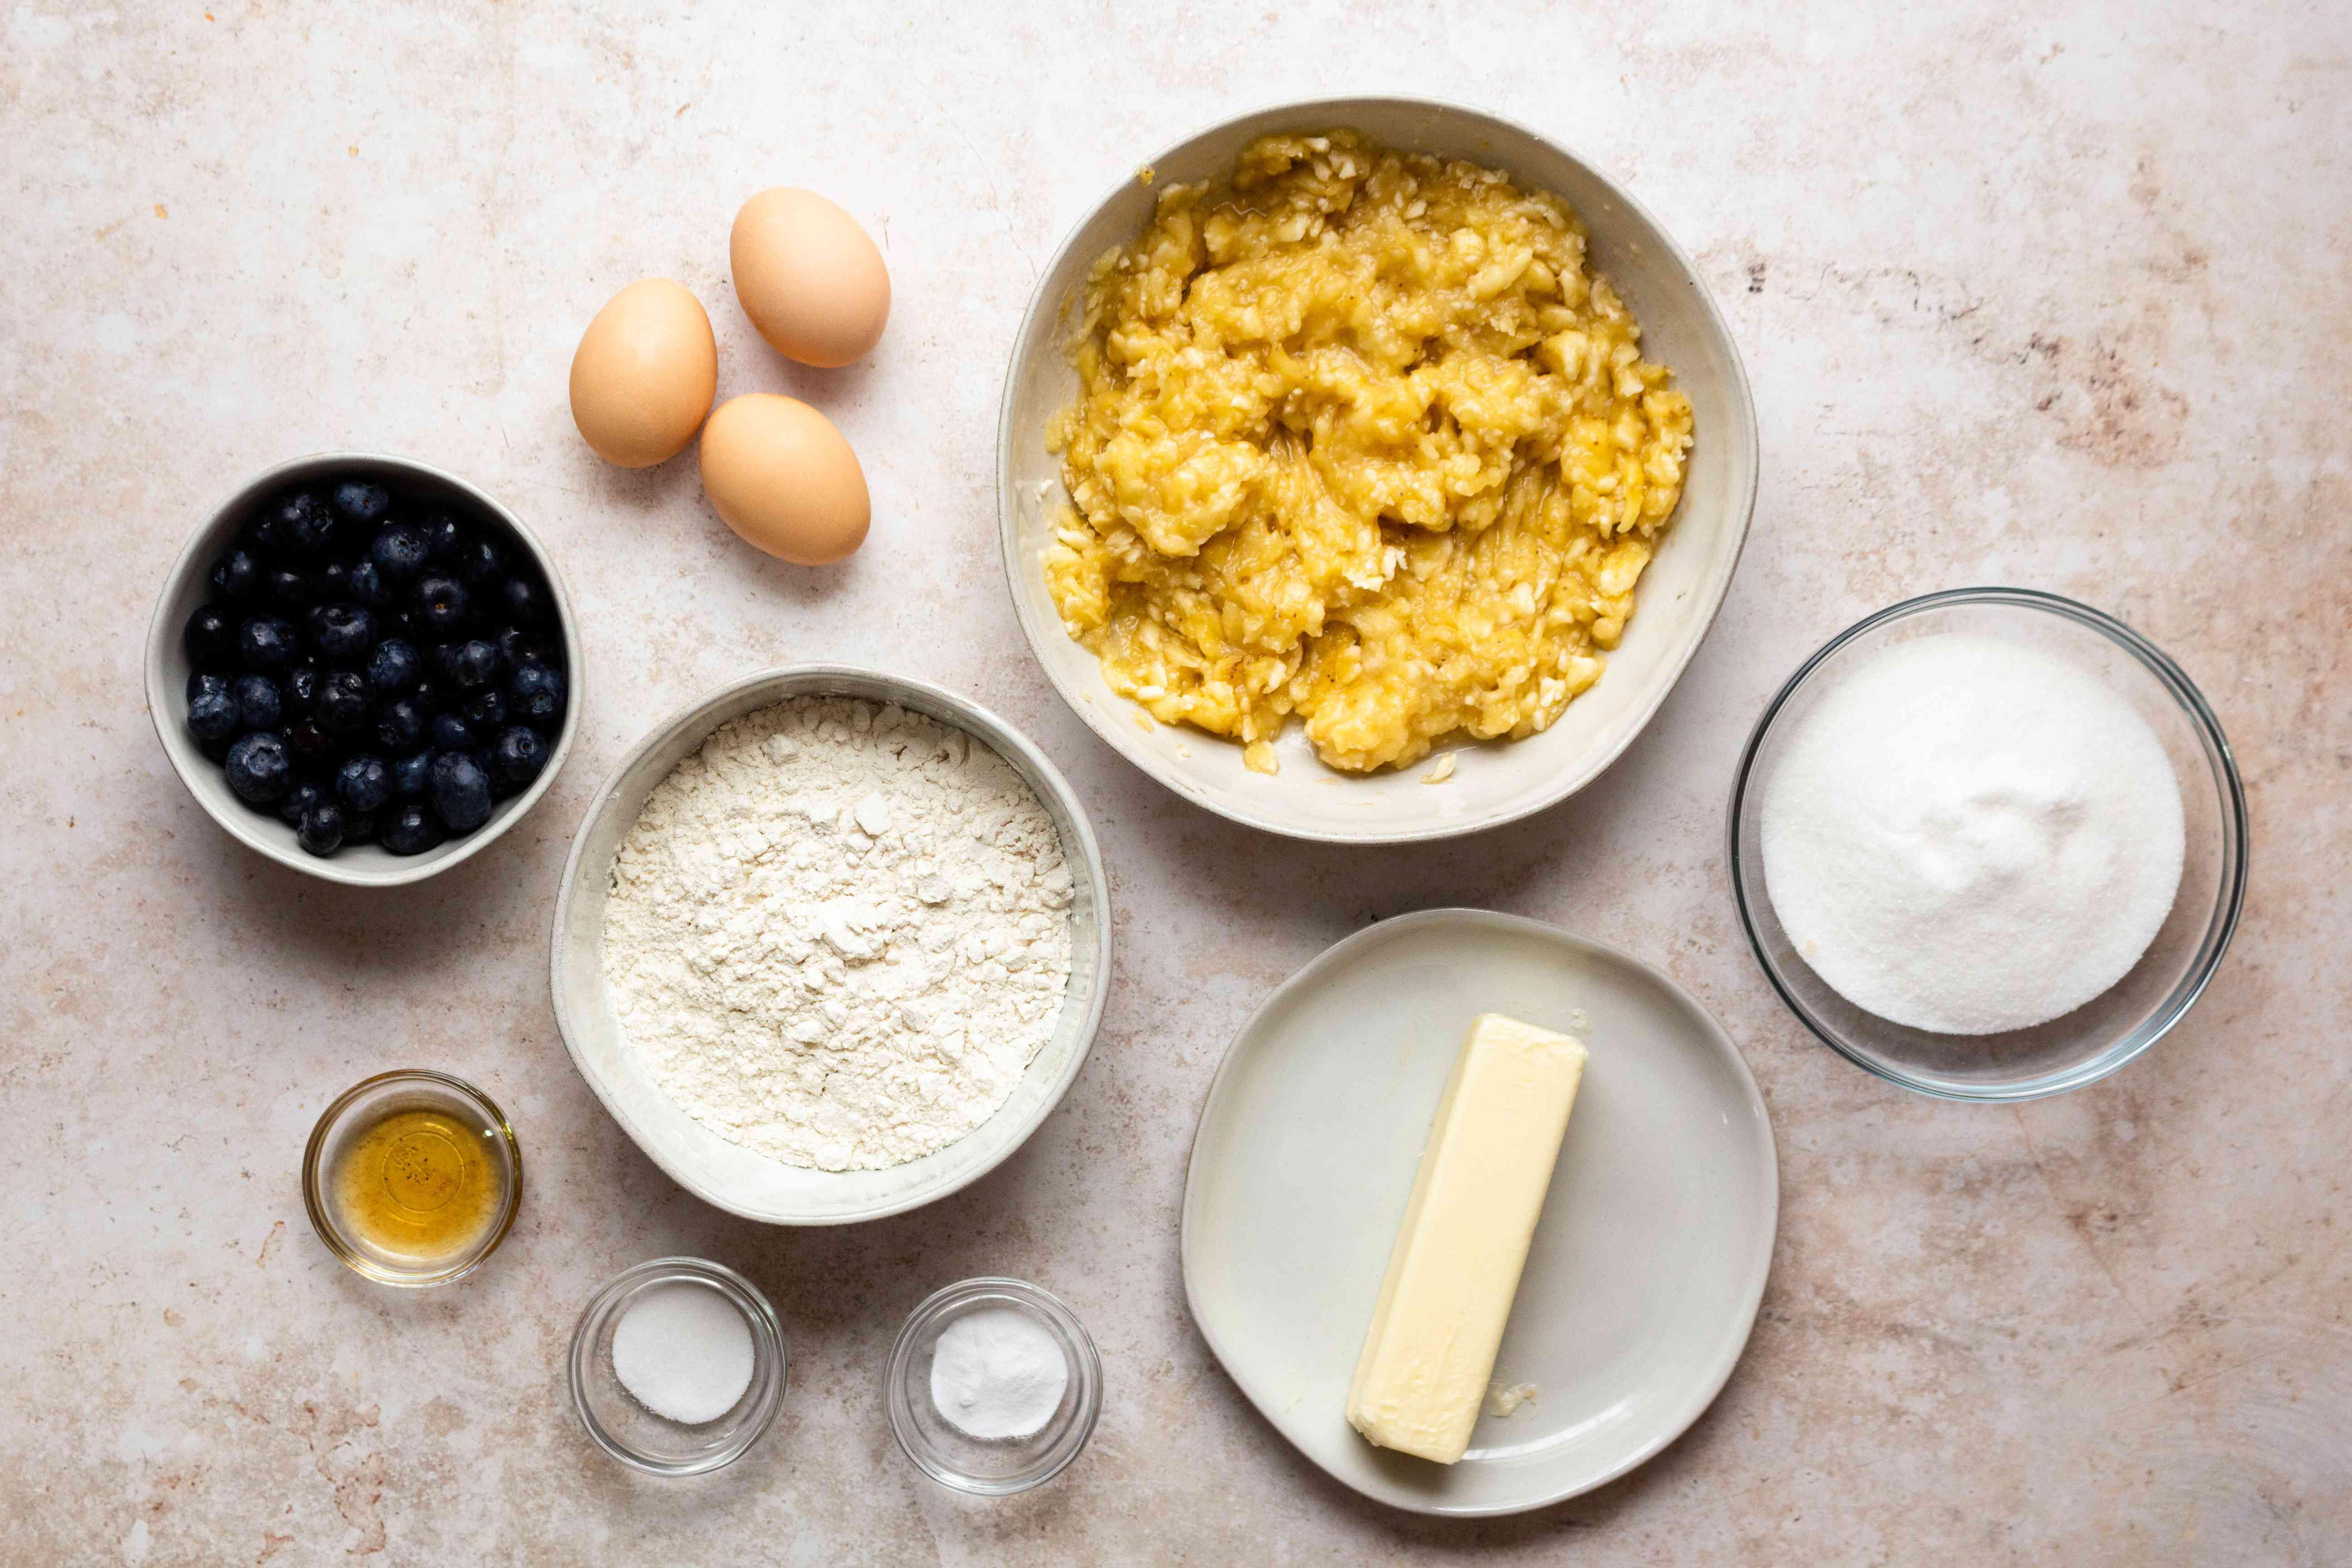 Blueberry Banana Cake ingredients